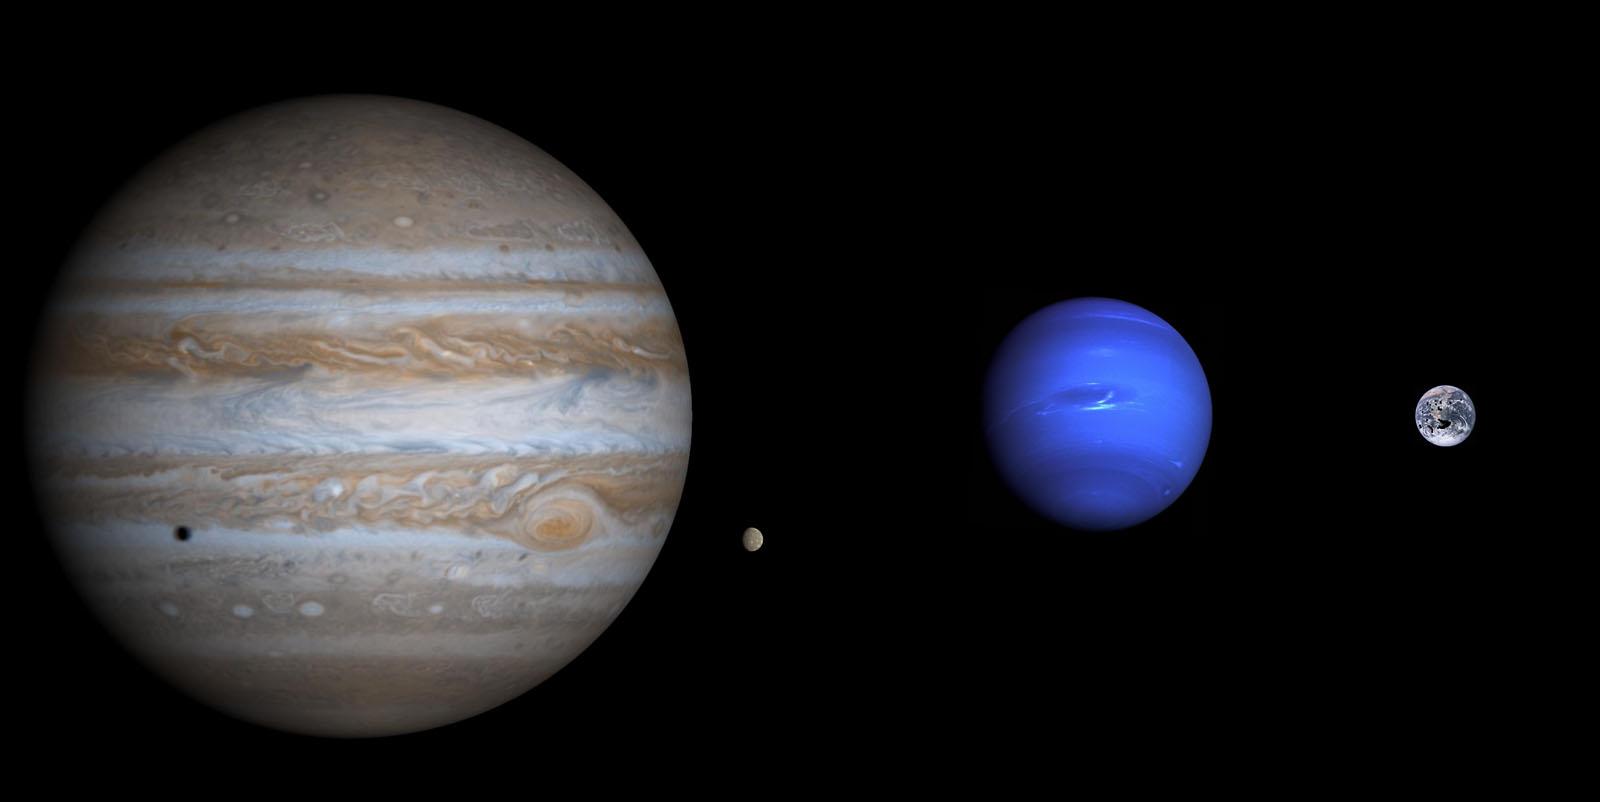 Hubble teleskop bestärkt riesen exomond u2013 alpha cephei